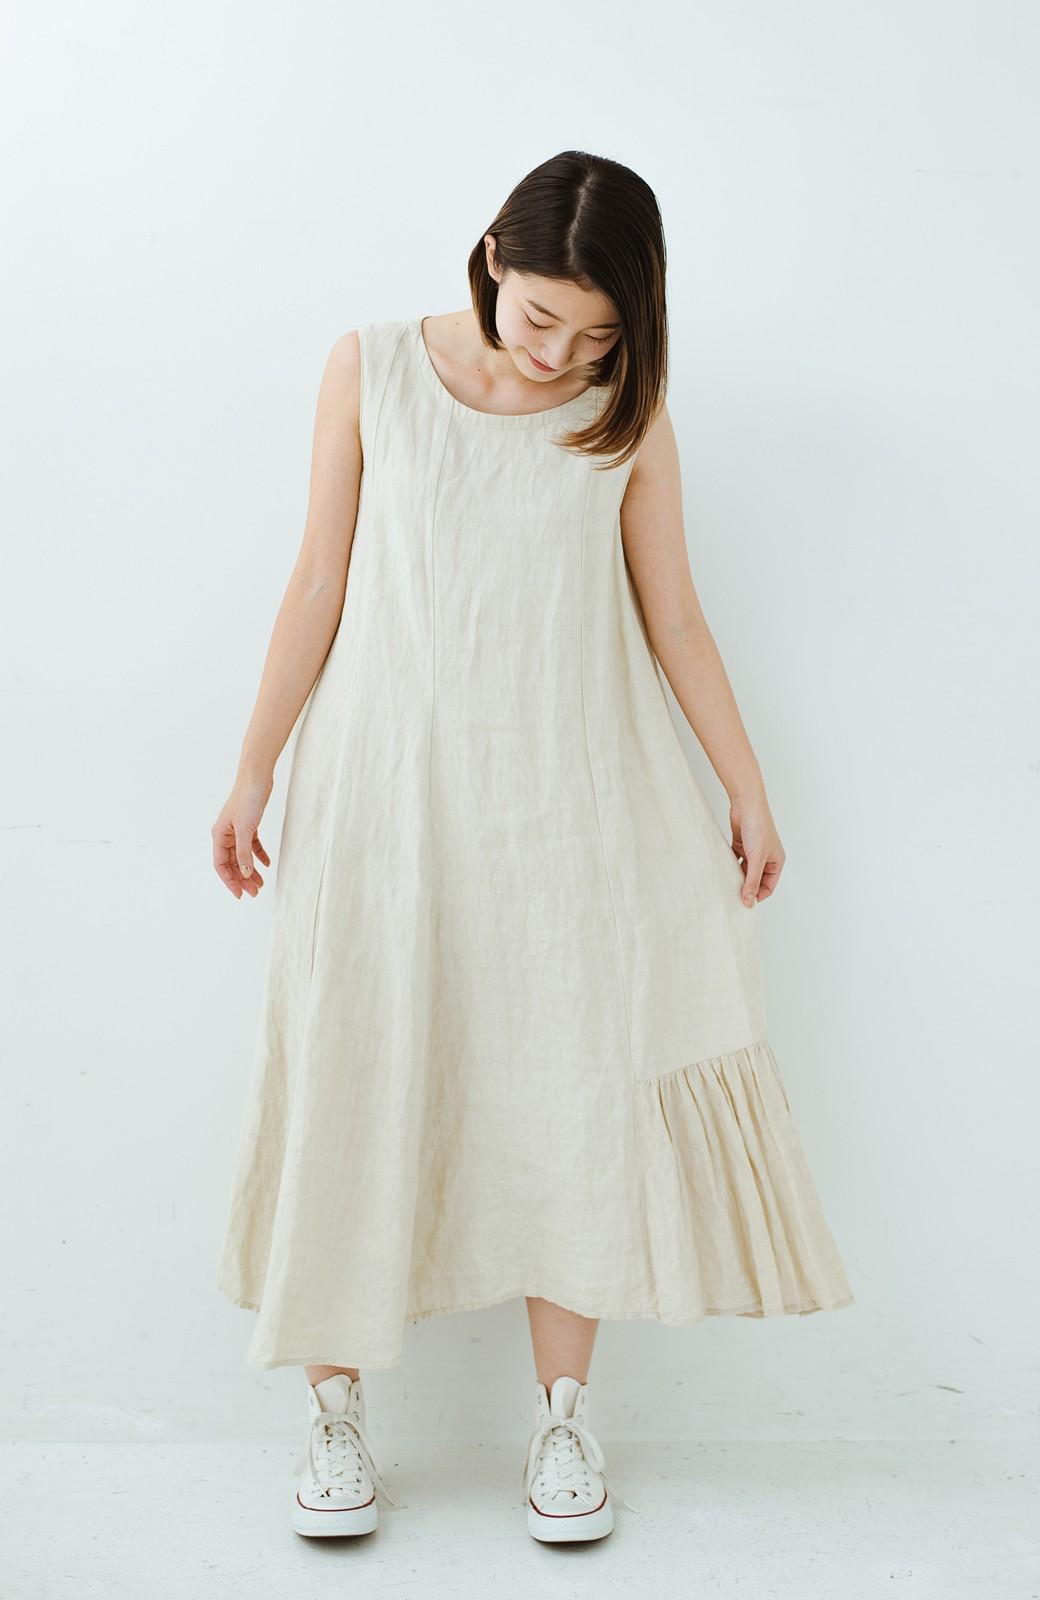 haco! てとひとて Miho Umezawa TWILL LINEN アシンメトリードレス <ライトベージュ>の商品写真9